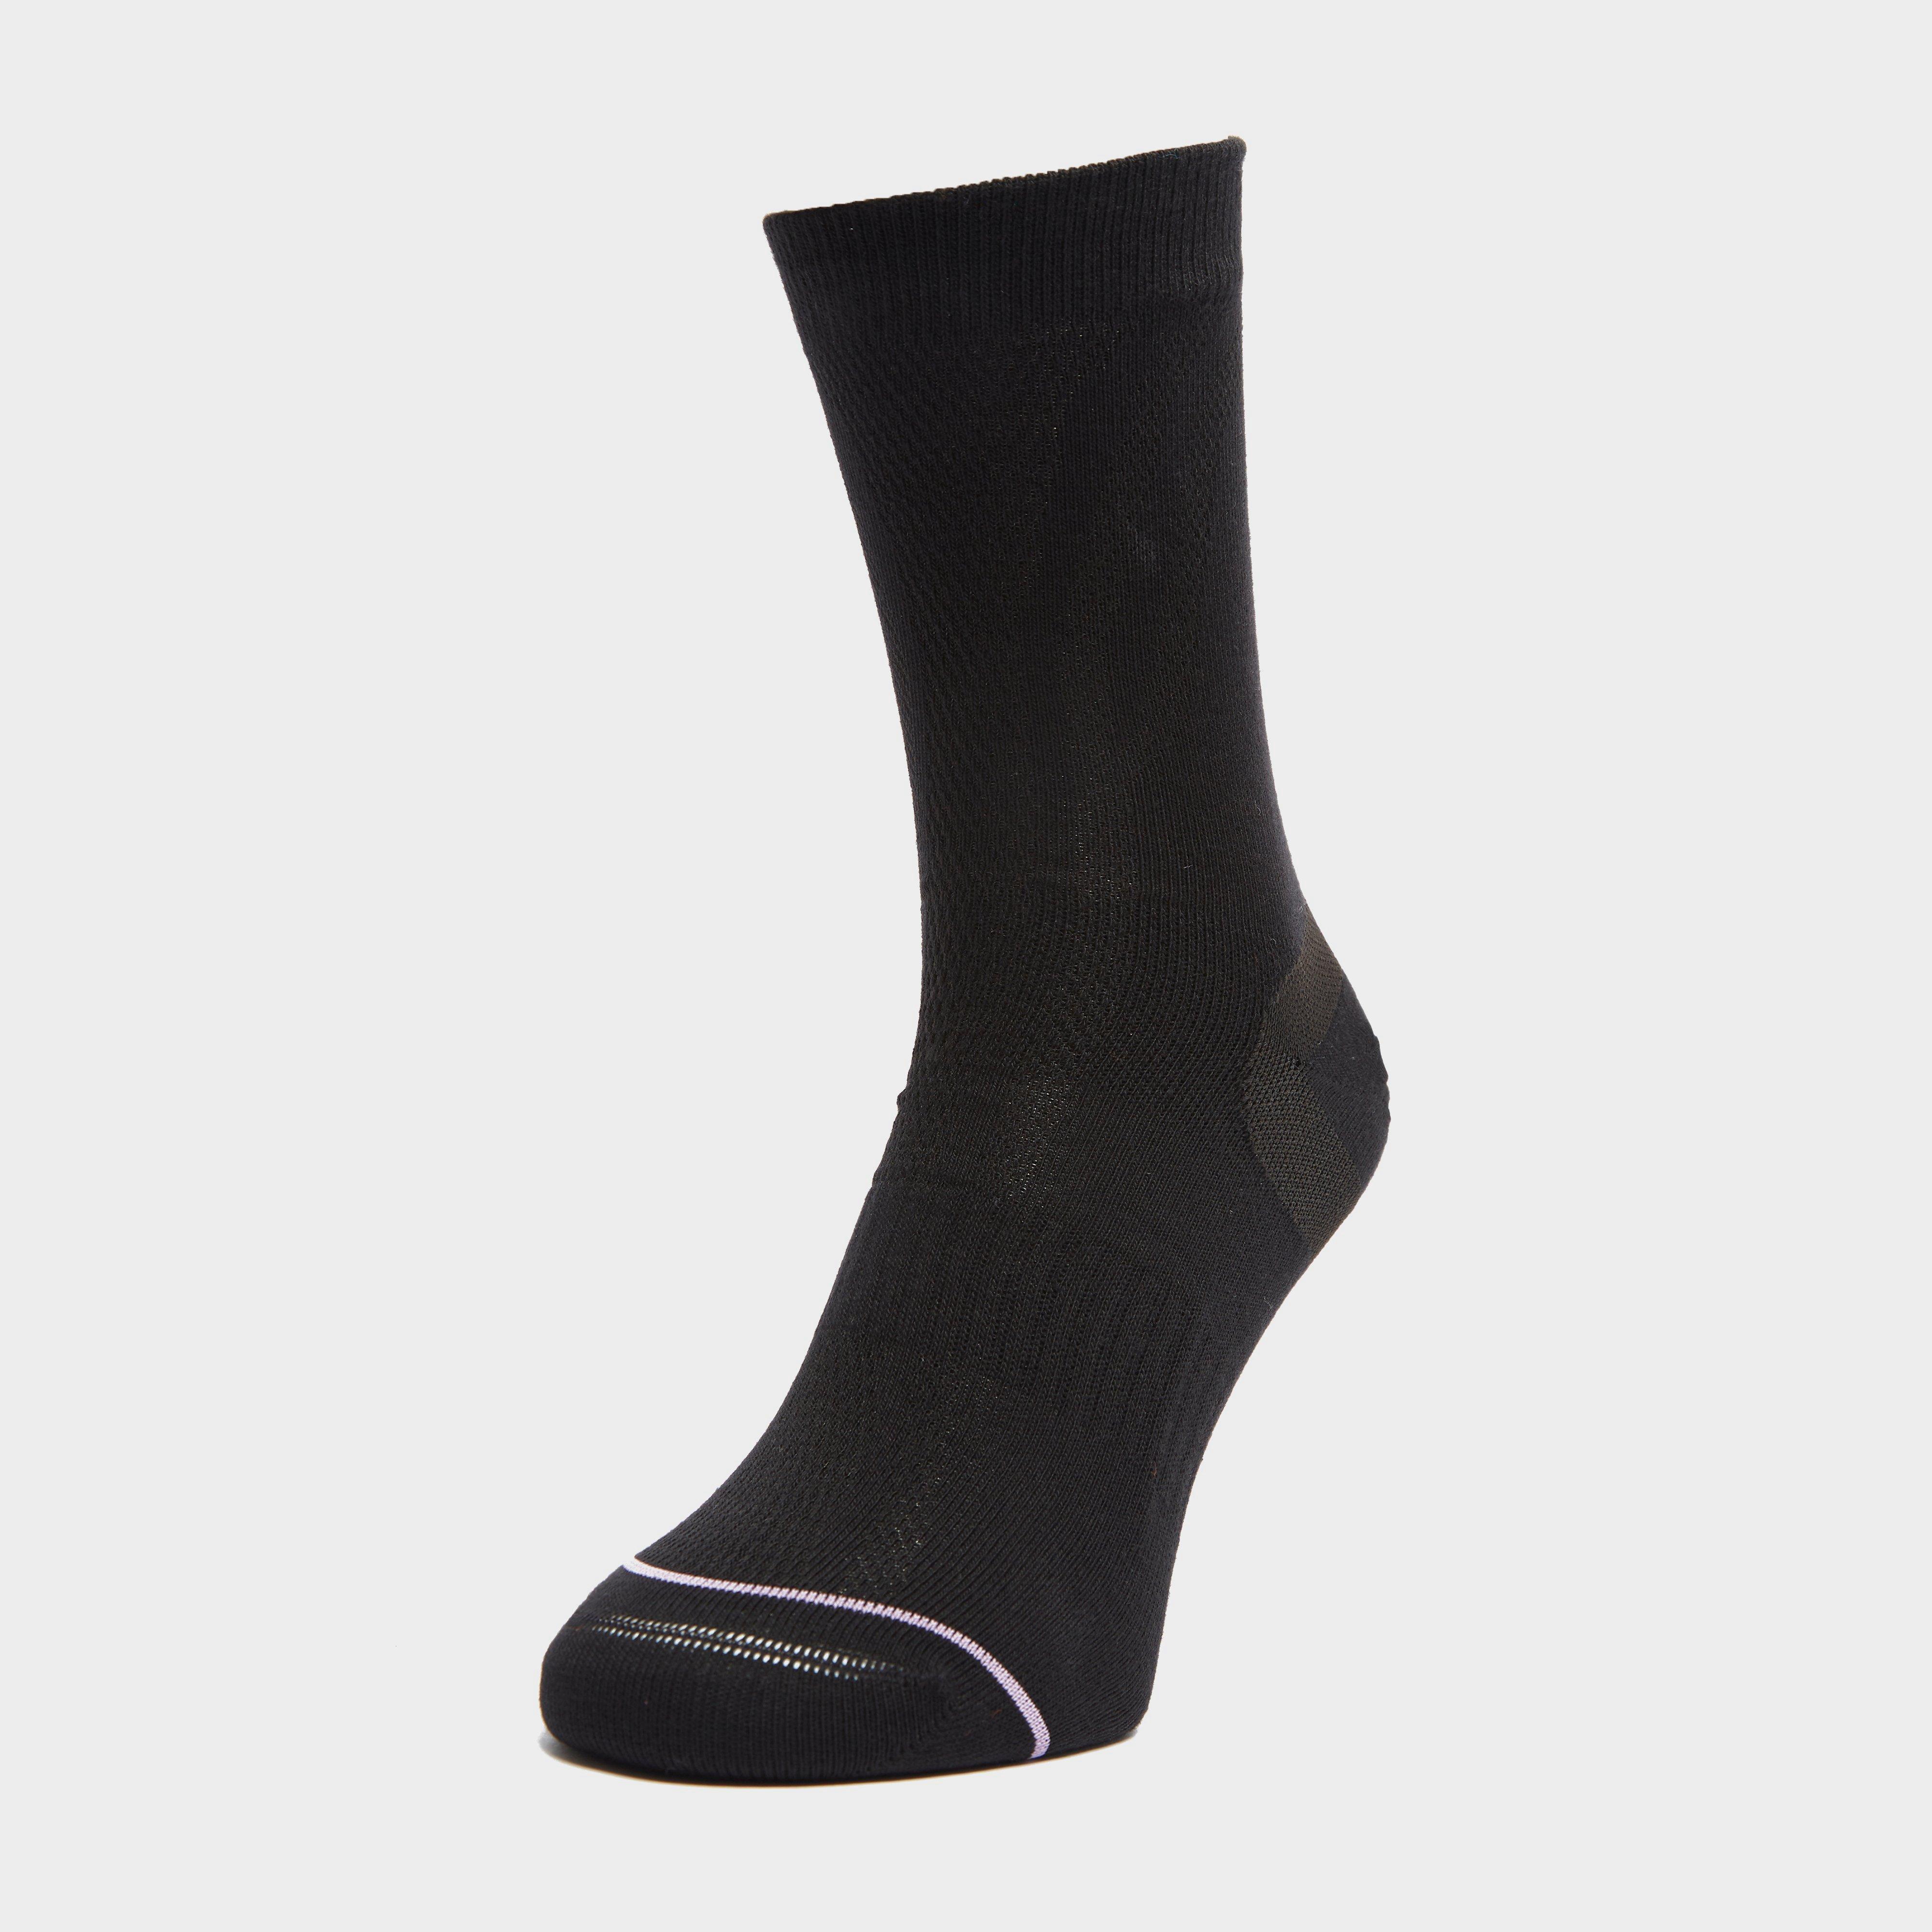 Image of 1000 Mile Tactel Ultimate Liner Socks - Black/Black, BLACK/Black